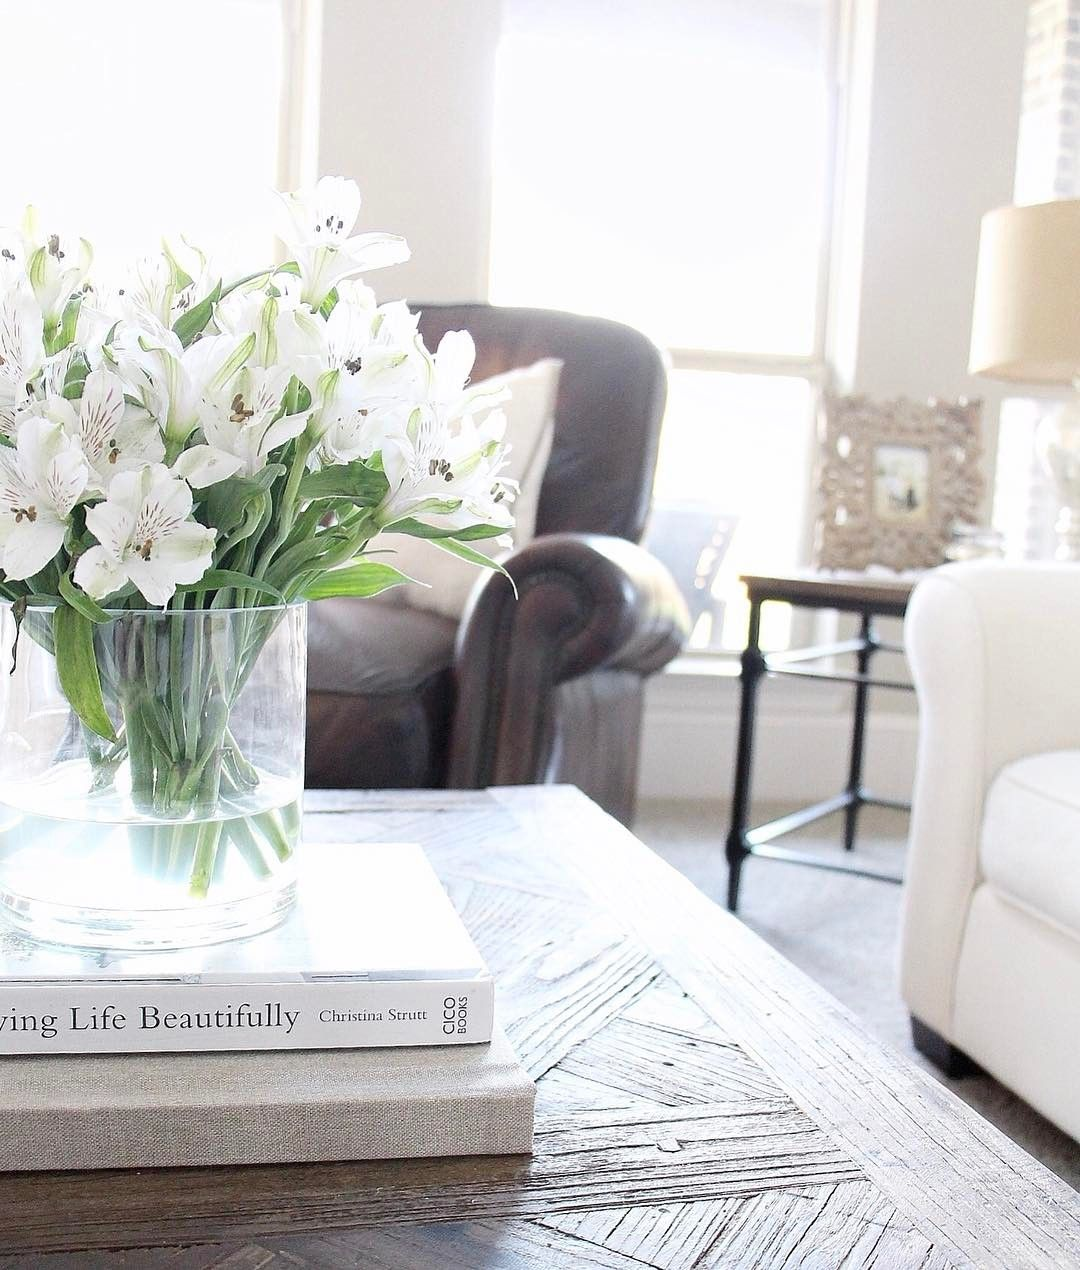 Kitchen Tea Table Decoration Ideas: Gather In Grace - Decor Ideas